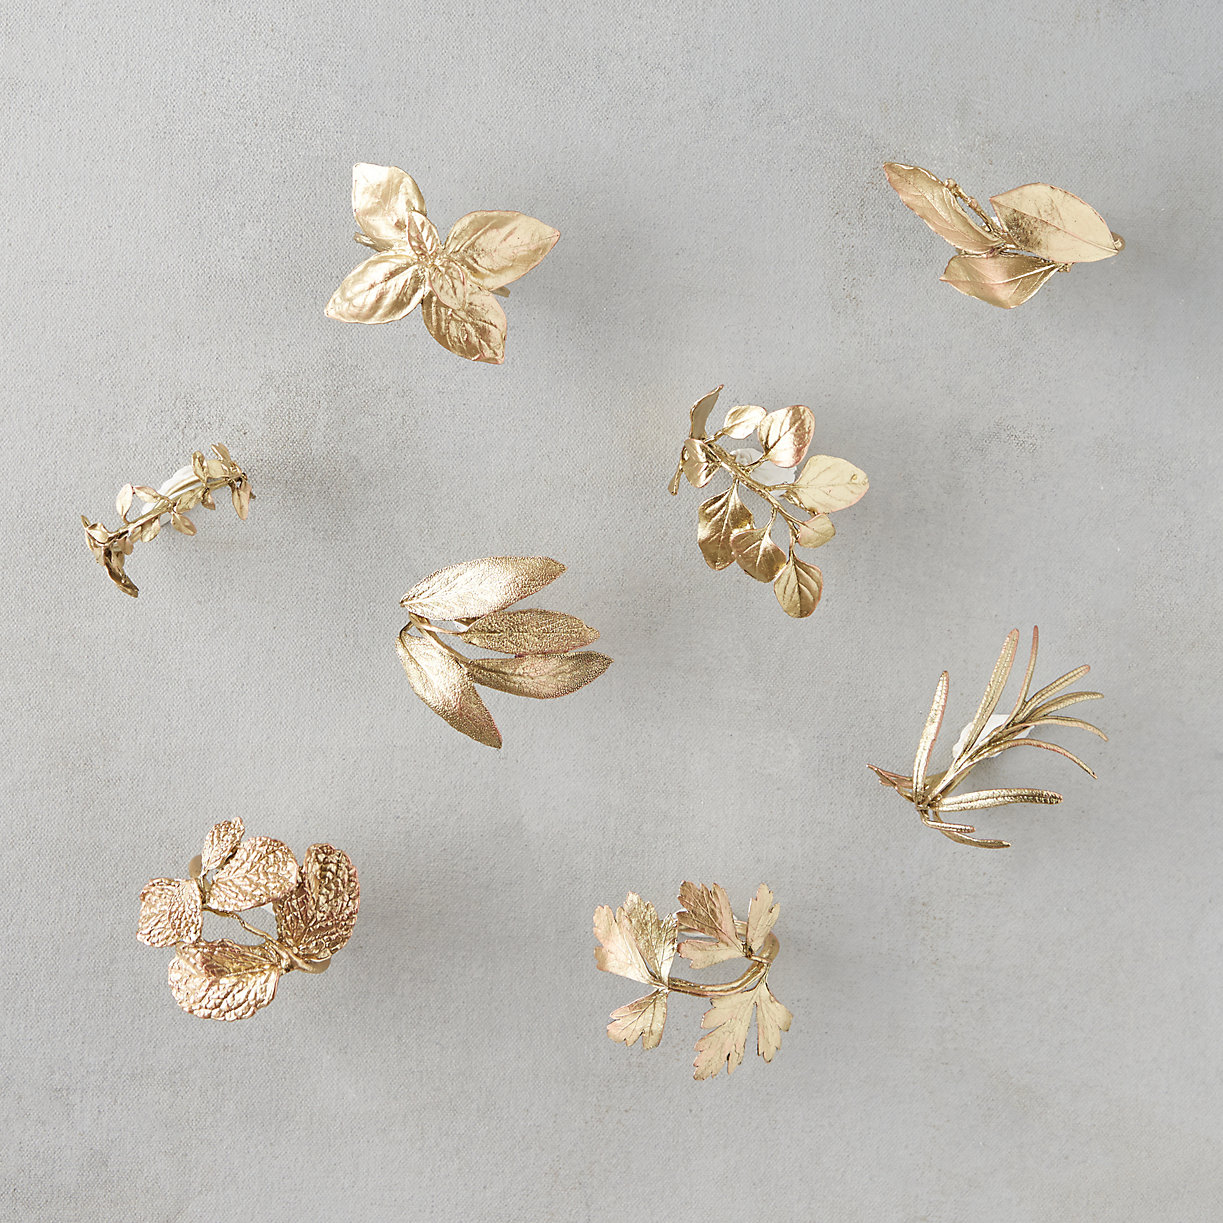 Herb Garden Napkin Rings, Set of 8